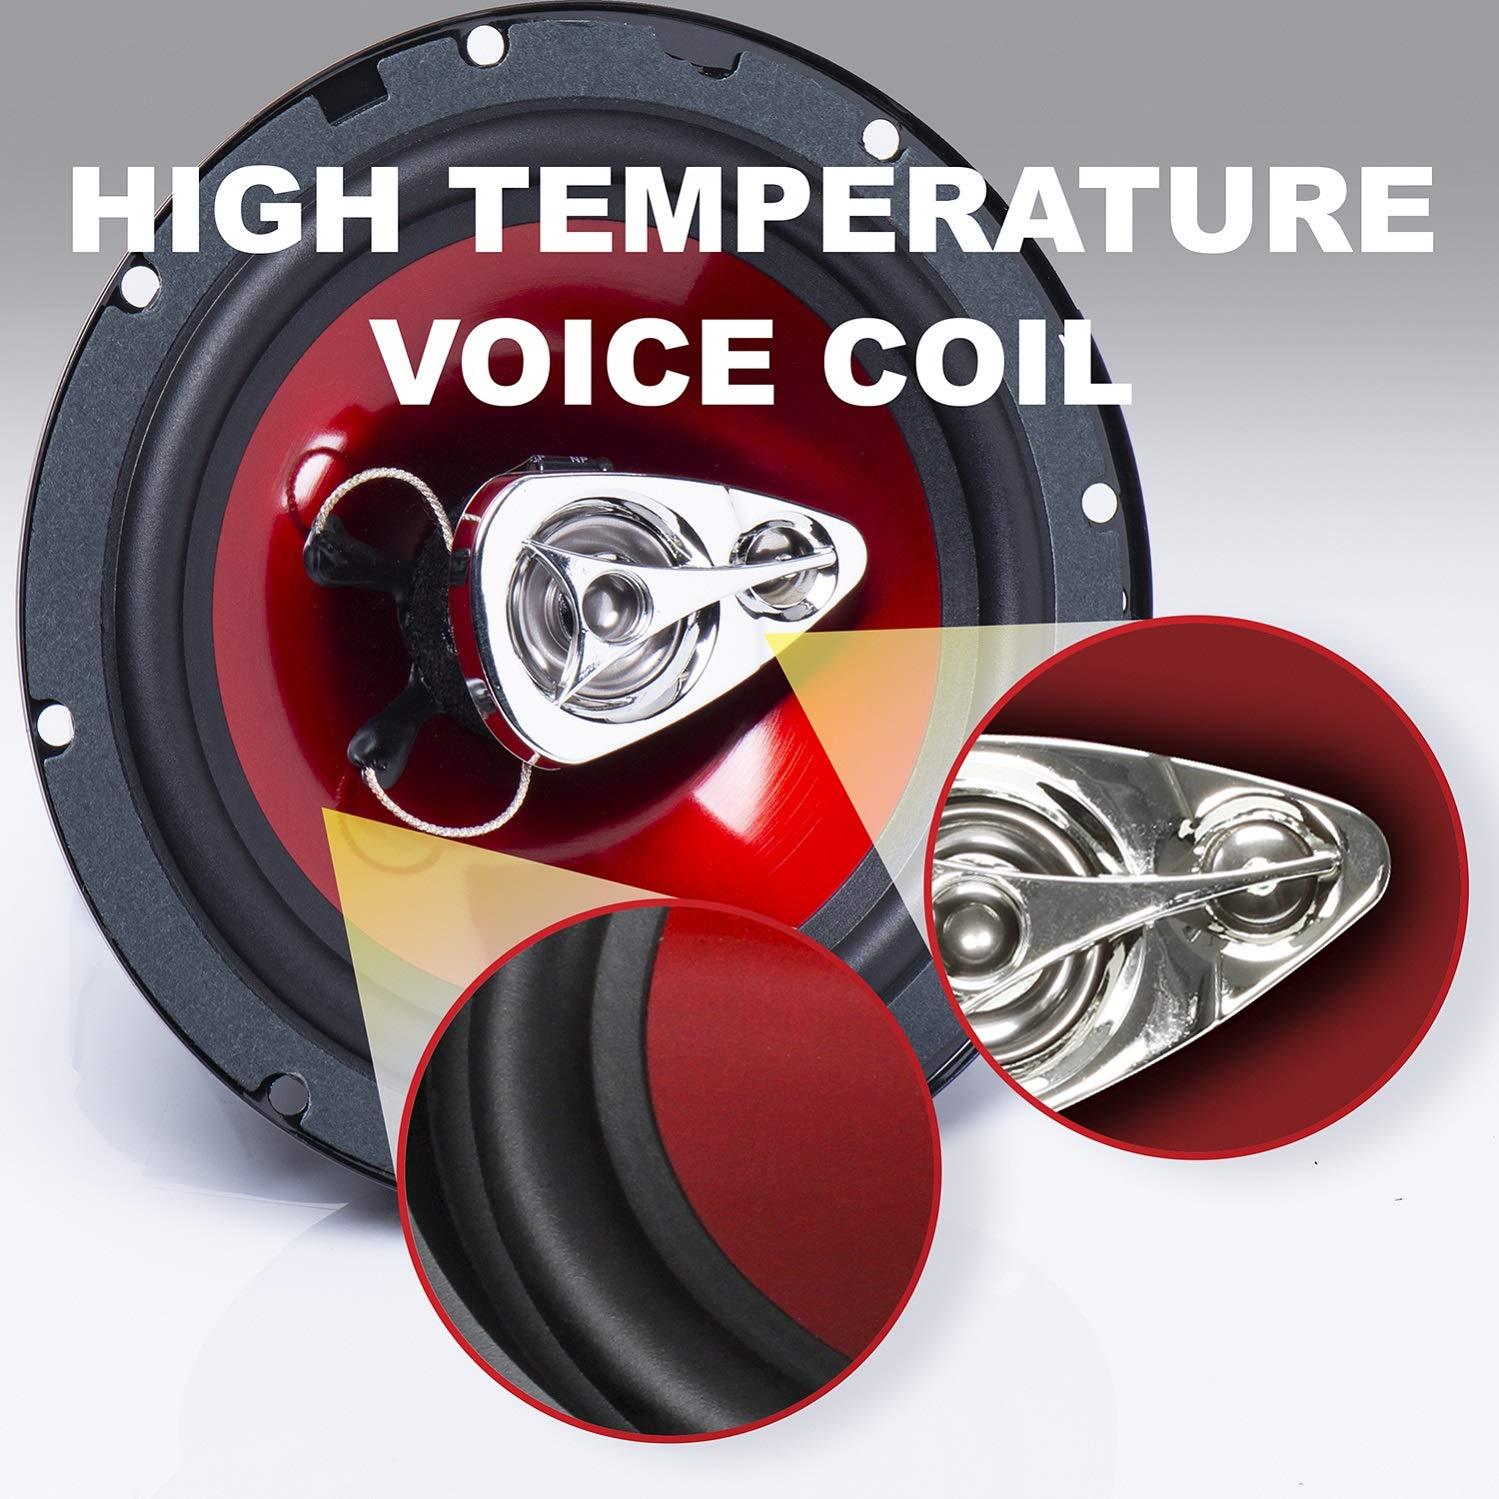 Amazon.com: BOSS Audio Caos Exxtreme de altavoces coaxiales ...